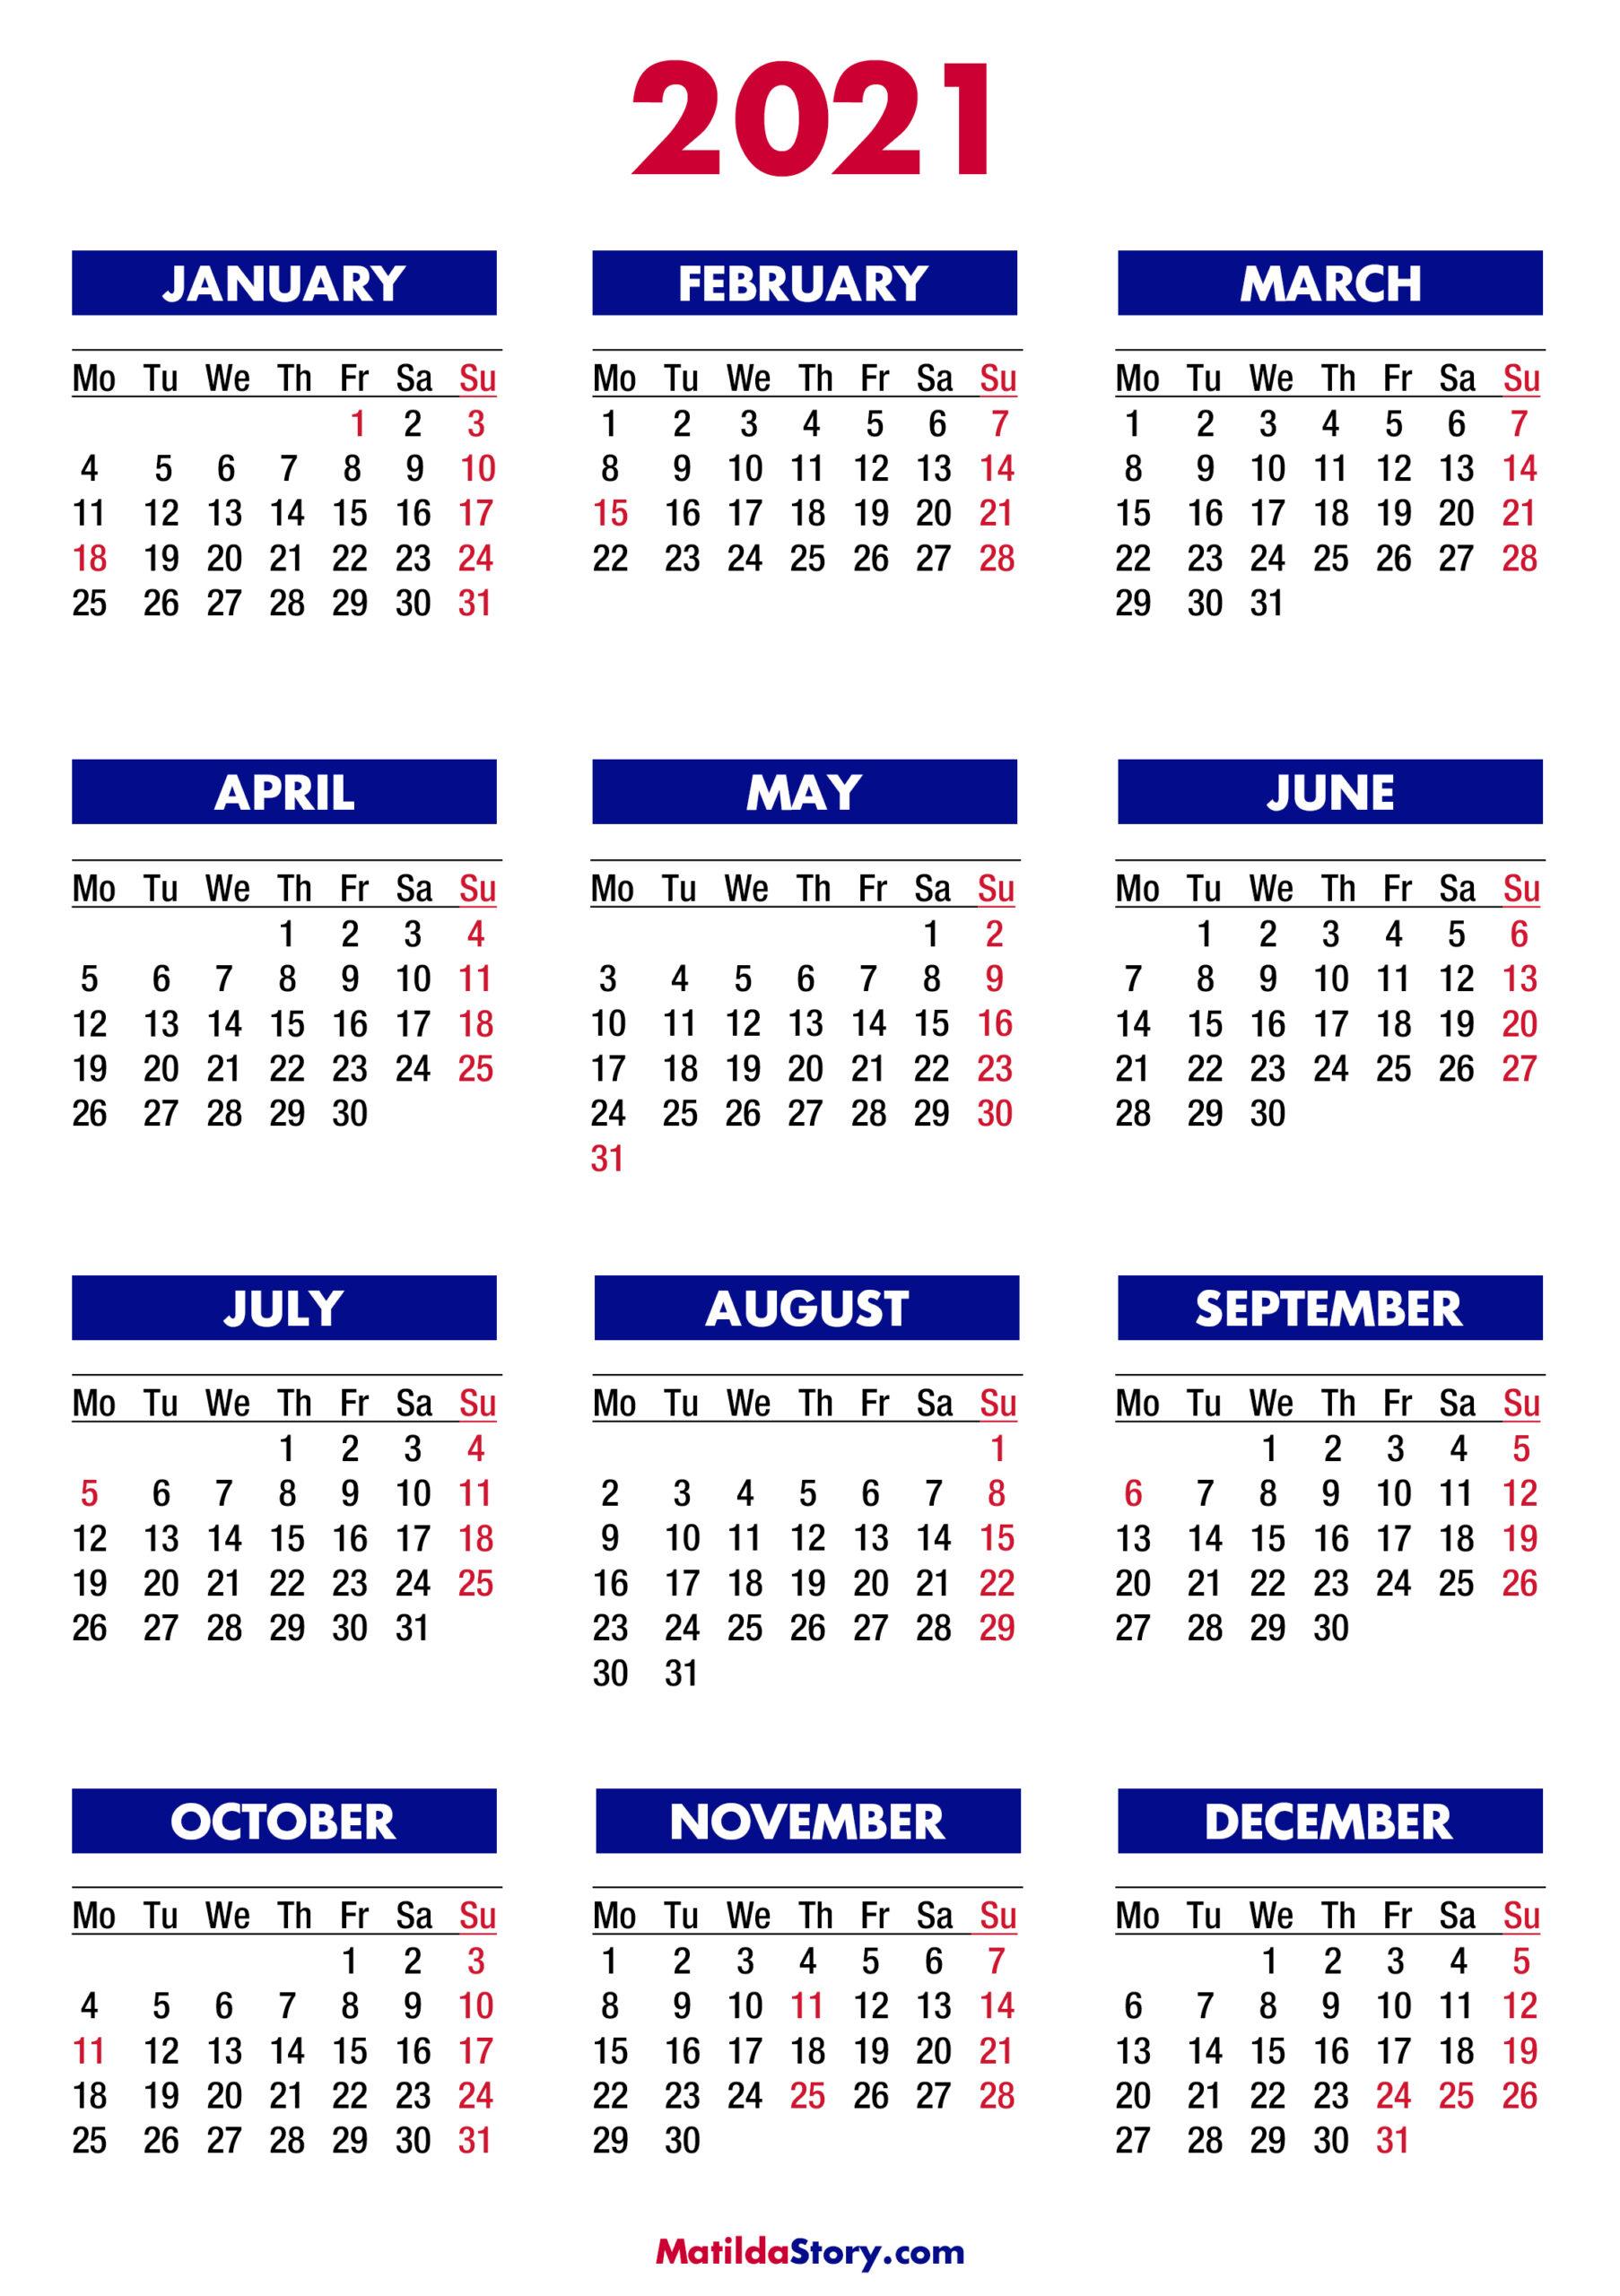 2021 Calendar With Holidays, Printable Free, Colorful